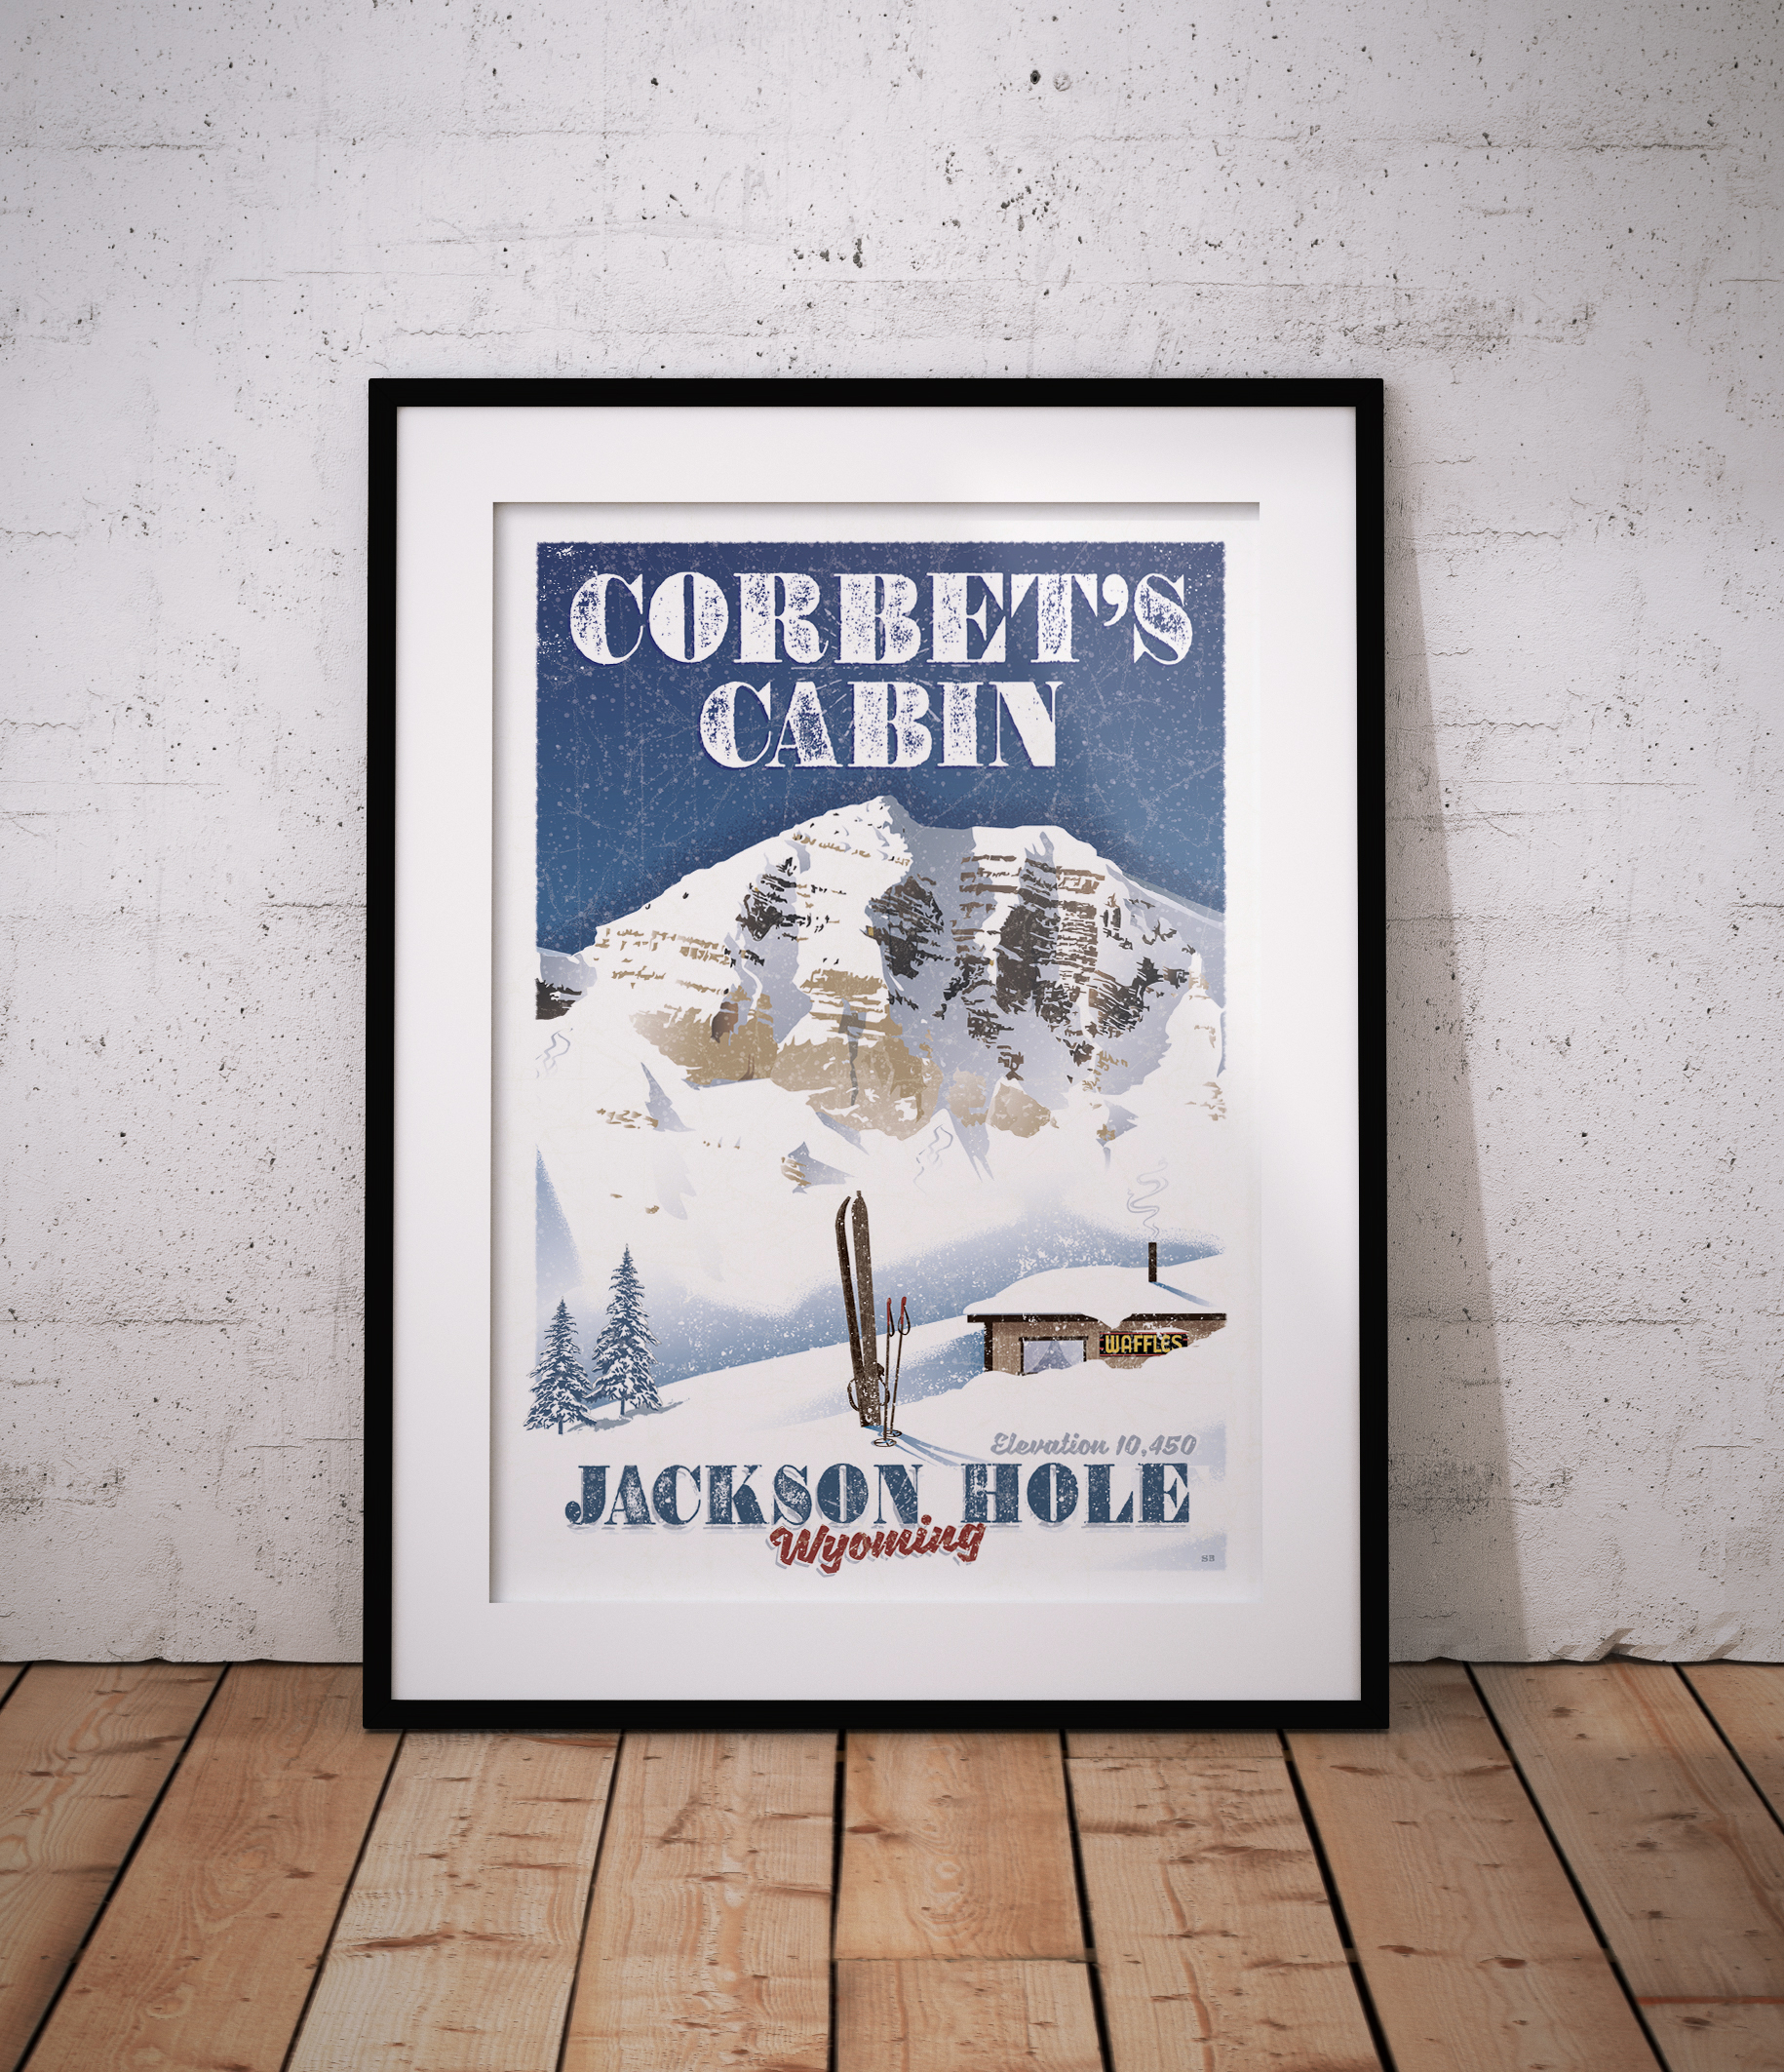 Mockup_Poster_Vertical_Corbets Cabin.jpg